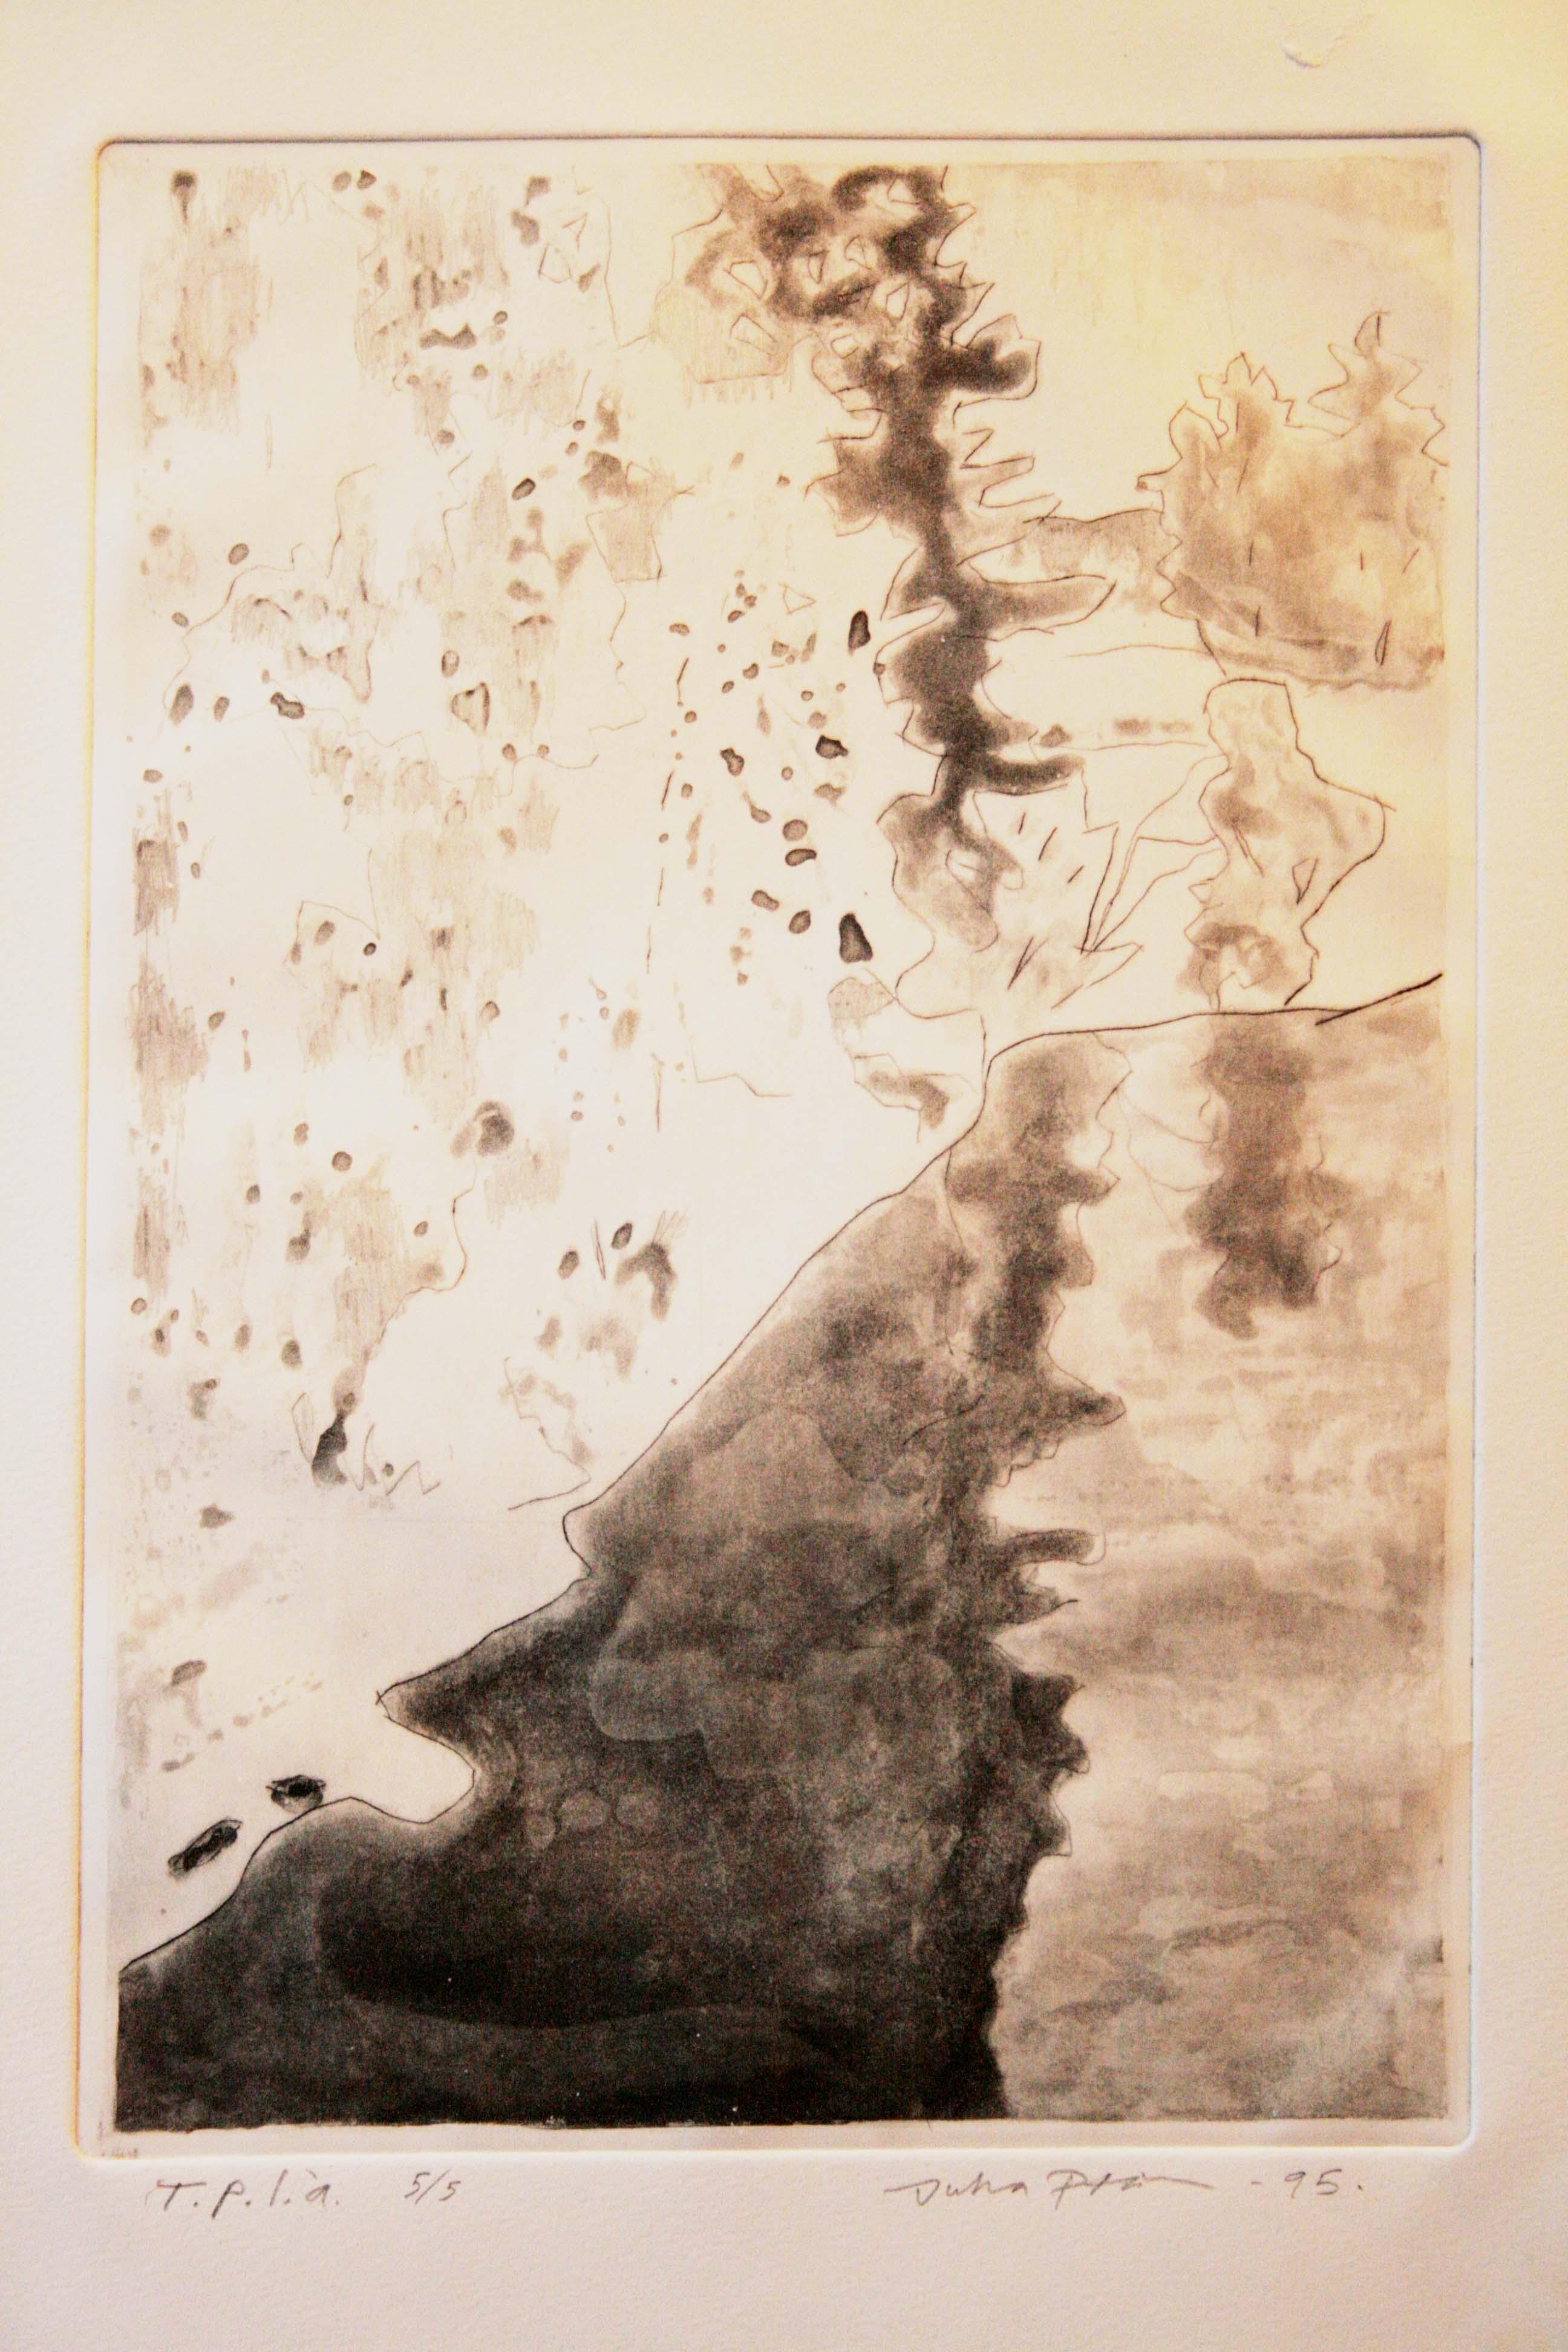 Talvimaisema,31x21cm,kuivaneula,etsaus,1995